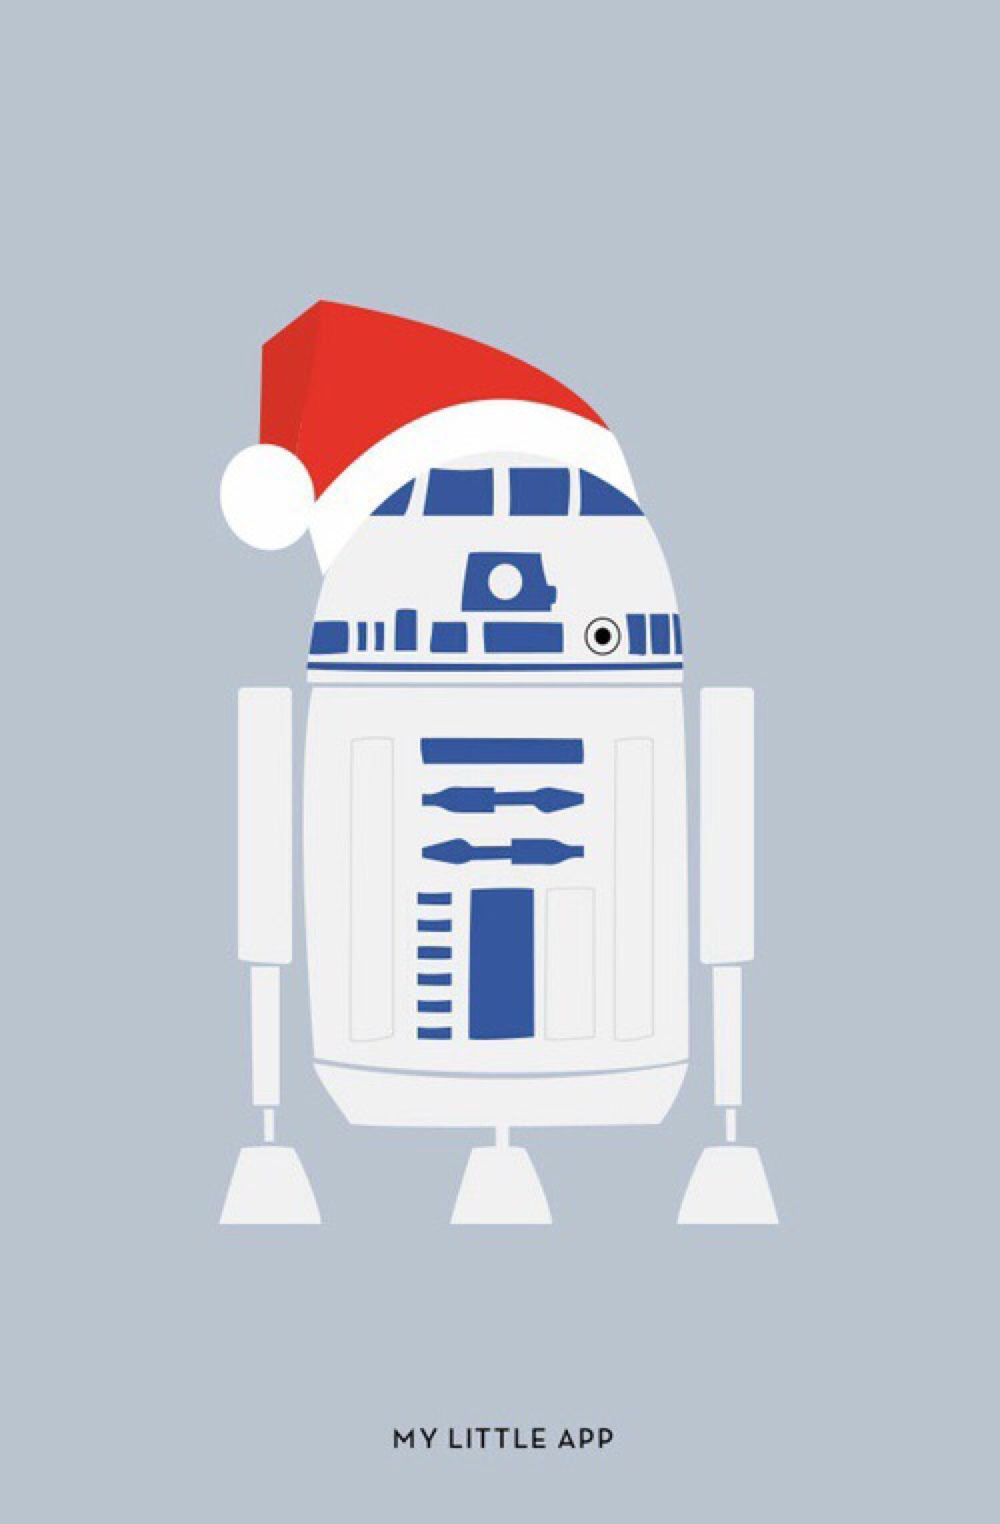 Wallpaper iphone tumblr star wars - Christmas Wallpaper Tumblr Star Wars